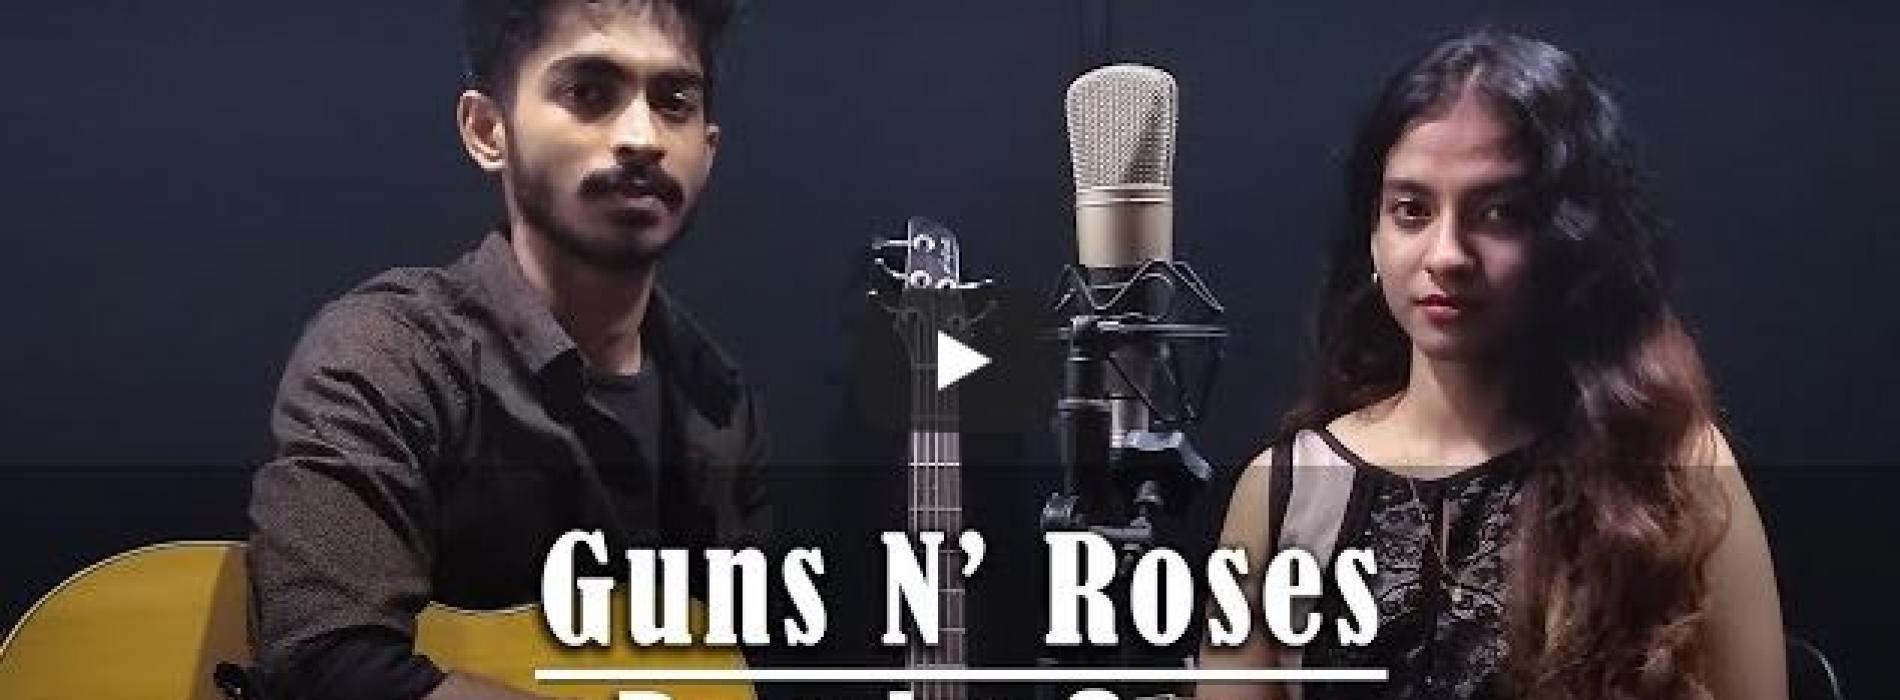 New Music : Guns N' Roses – Don't Cry Cover (Tania Melanie & Ravindu Weerappuli)